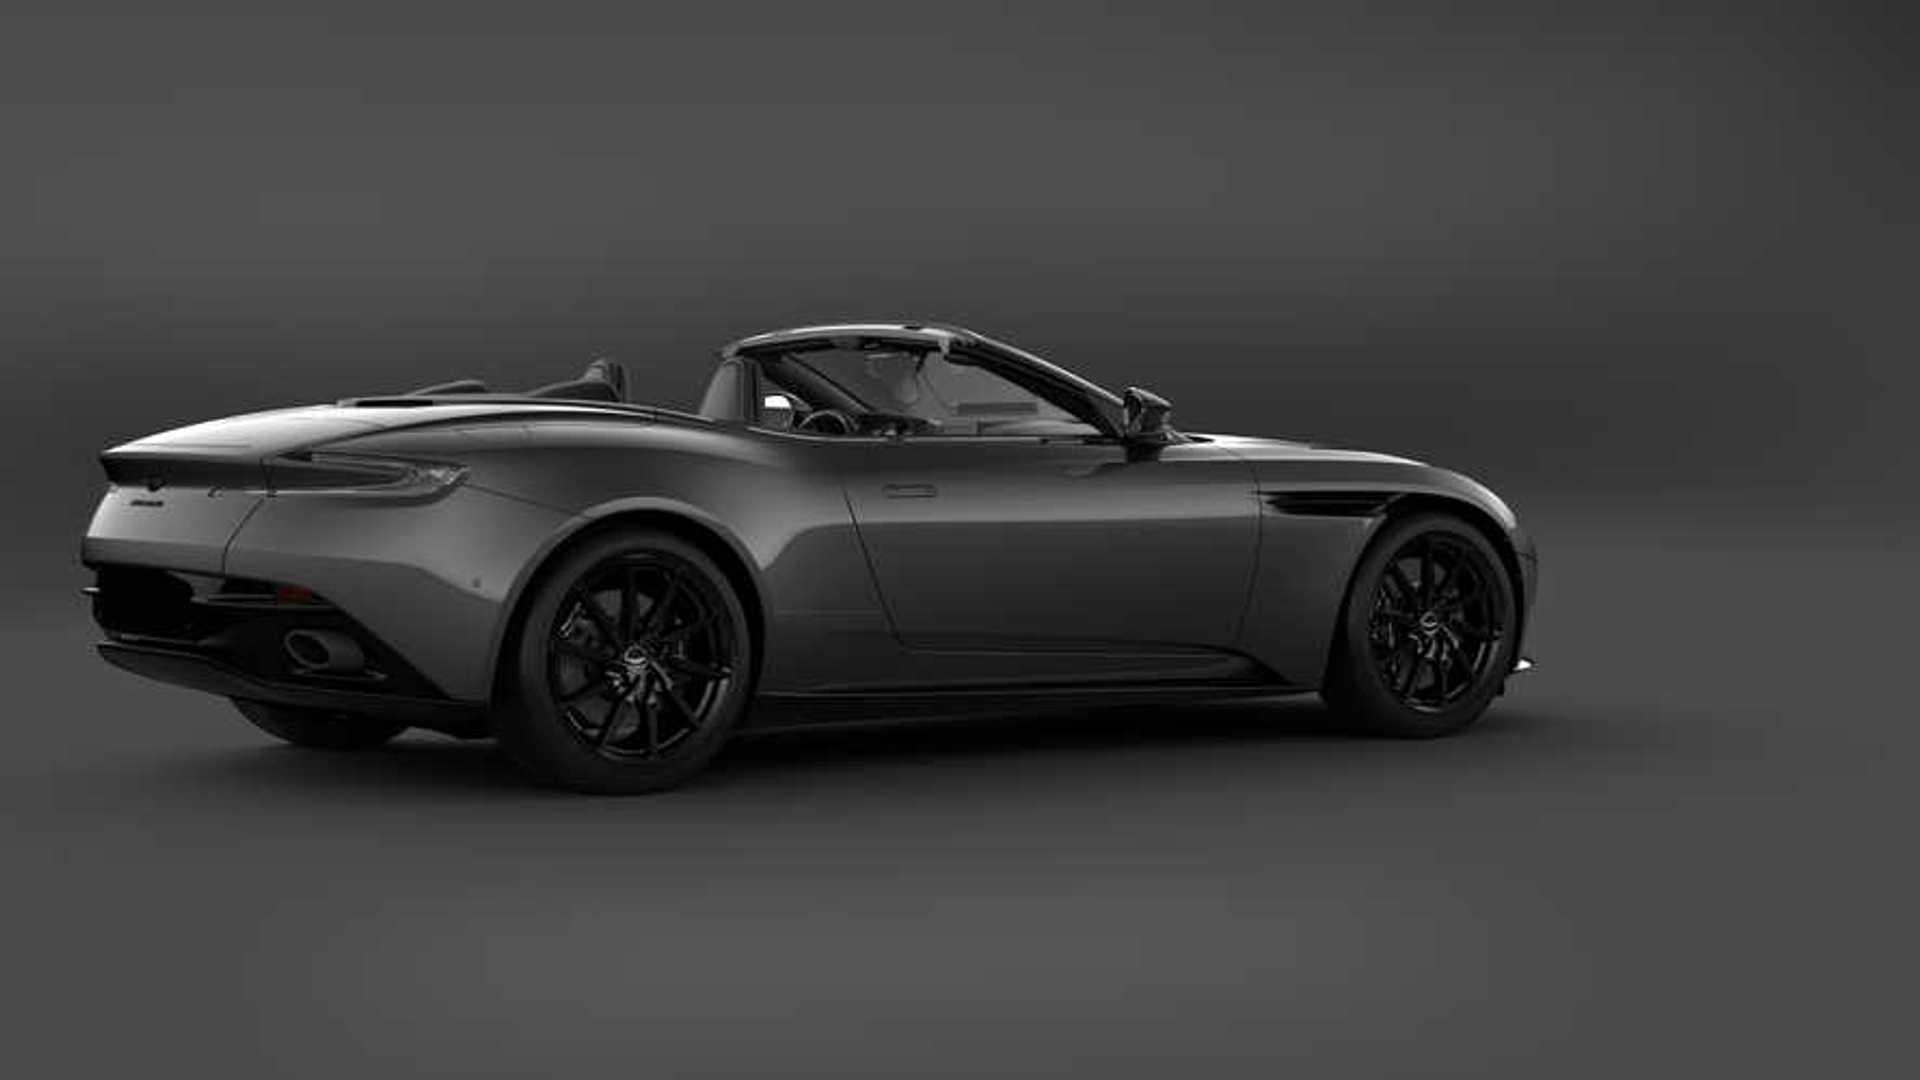 2021 Aston Martin Db11 V8 Shadow Edition Debuts Limited To 300 Units